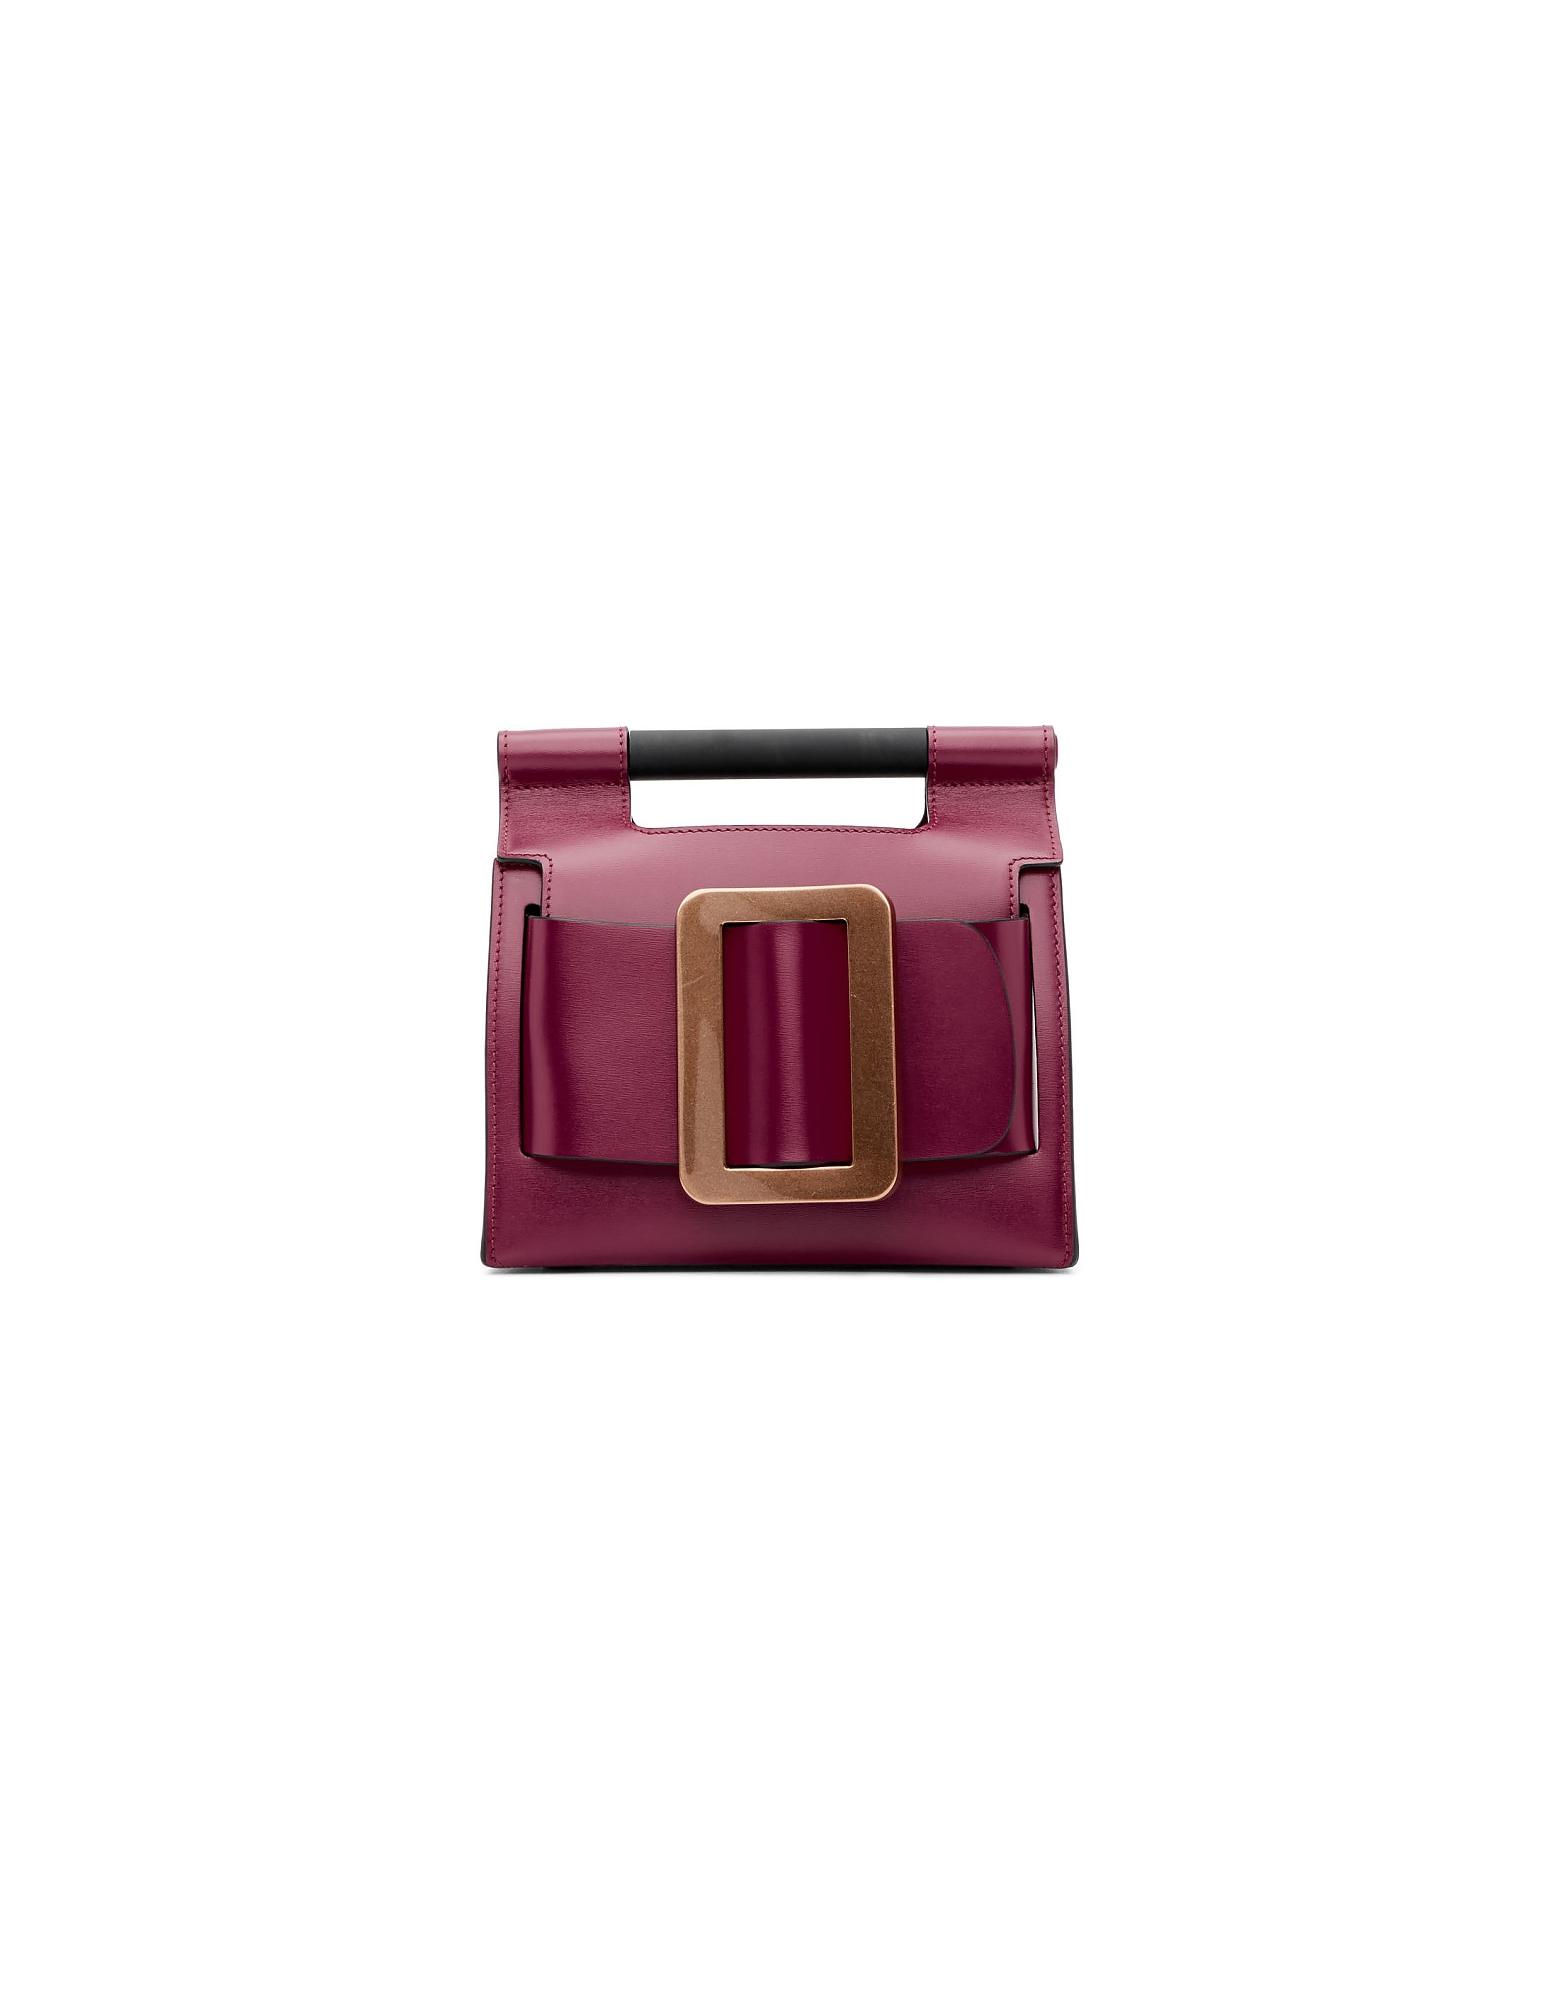 BOYY Designer Handbags, Purple Romeo 19 Bag